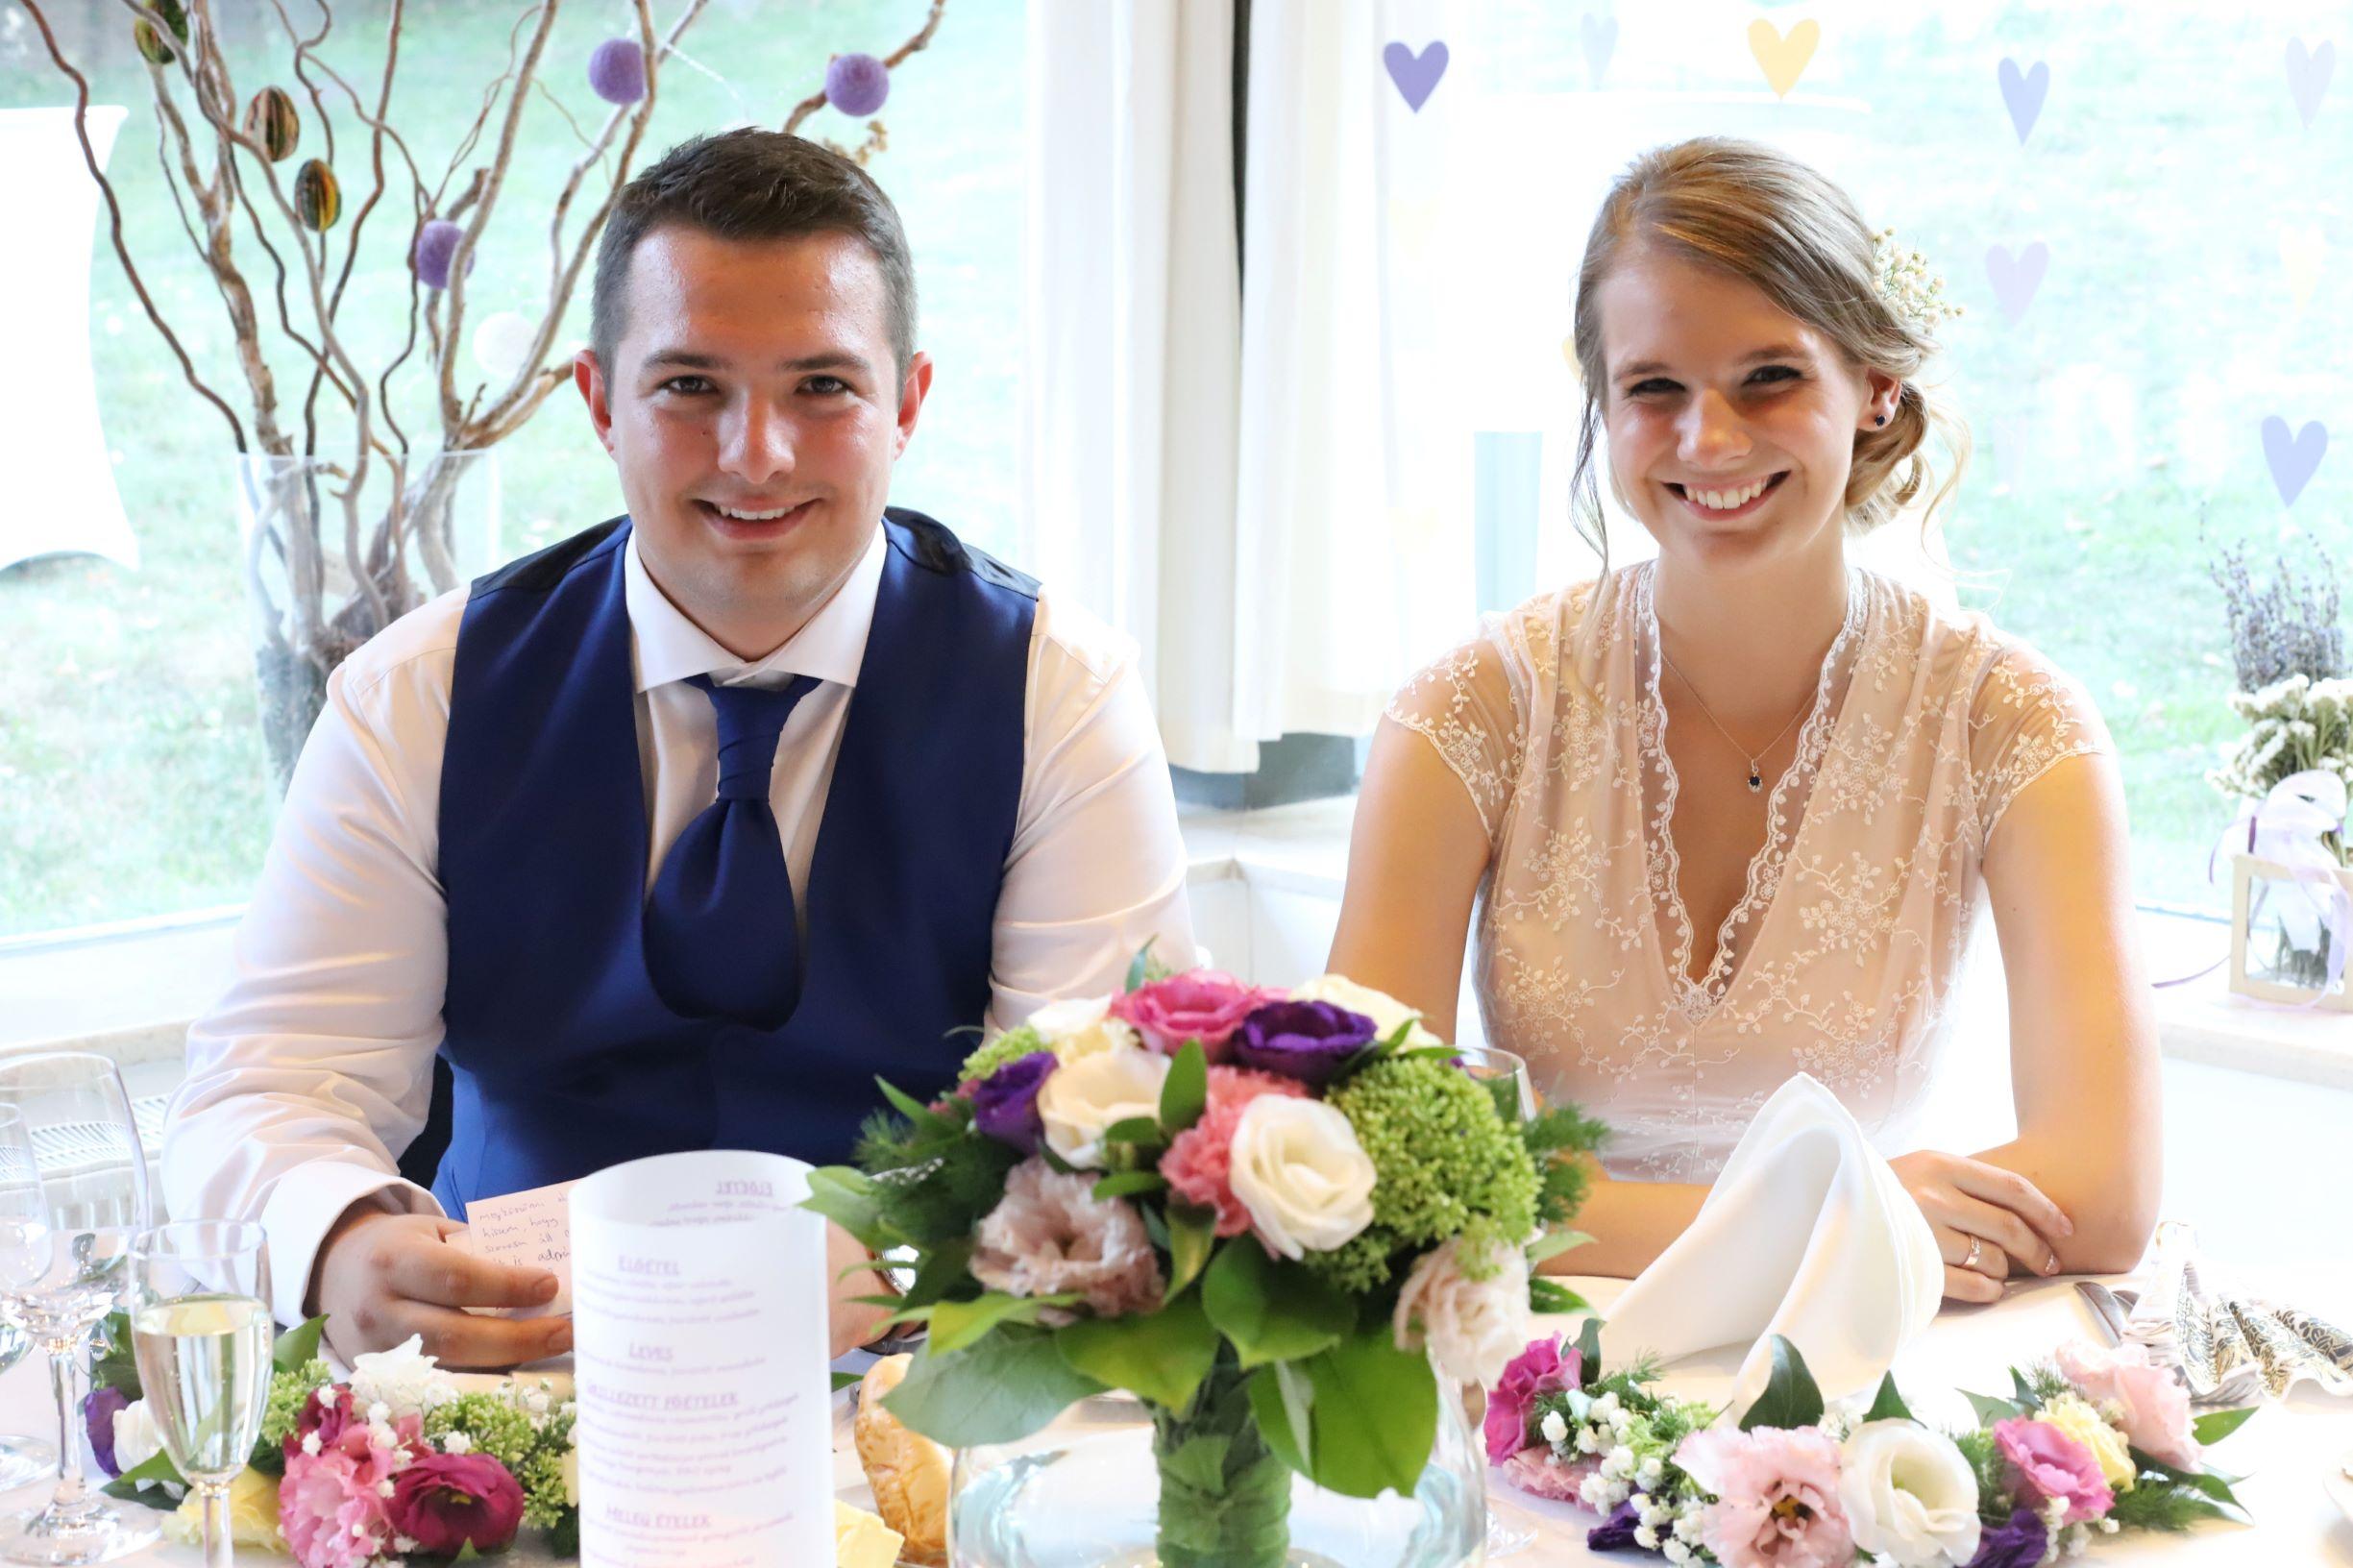 macro photography for wedding decor